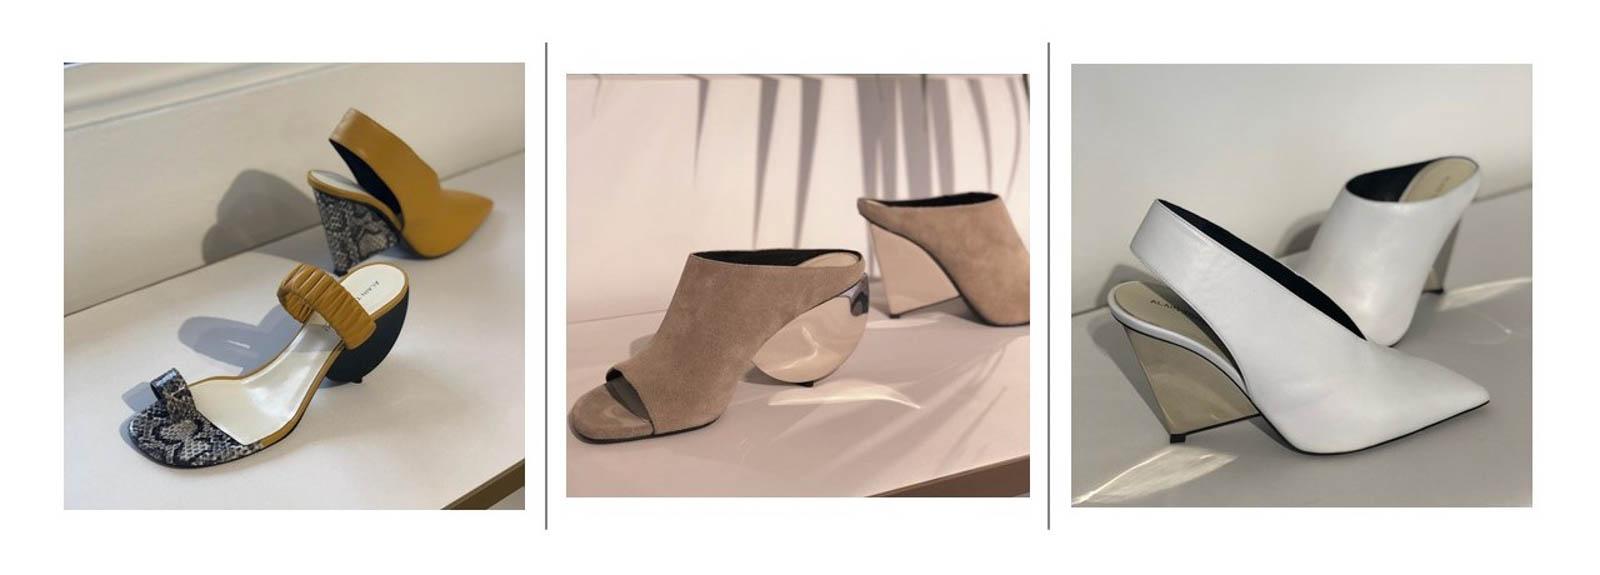 el-blog-de-silvia-rodriguez-street-style-mfw-milan-fashion-week-casadei-shoes-furla-bag-blouse-maria-elena-villamil-look-blogger